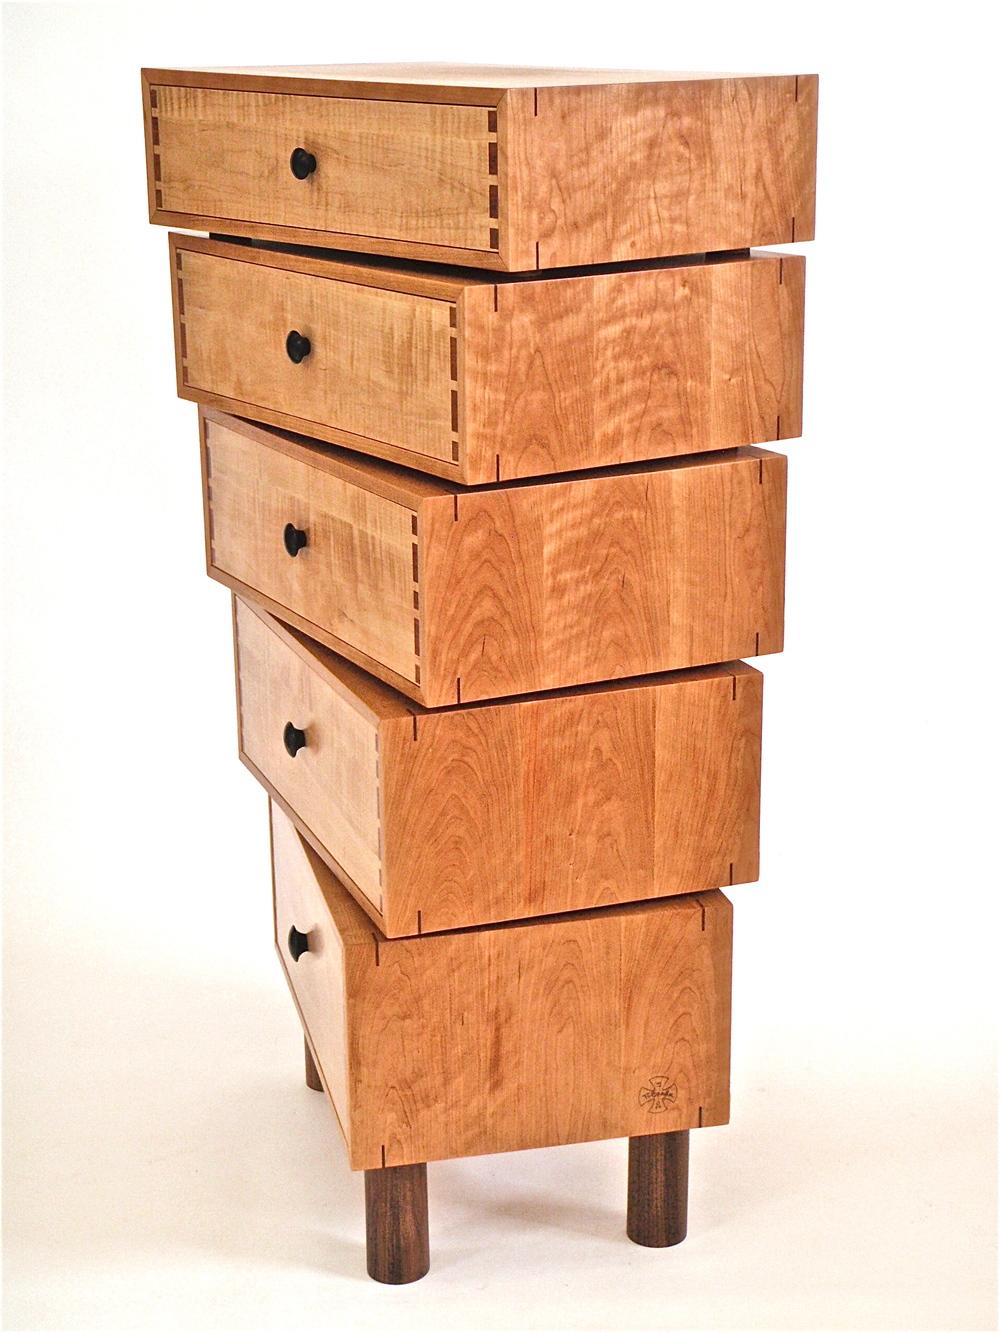 Stacked-box dresser